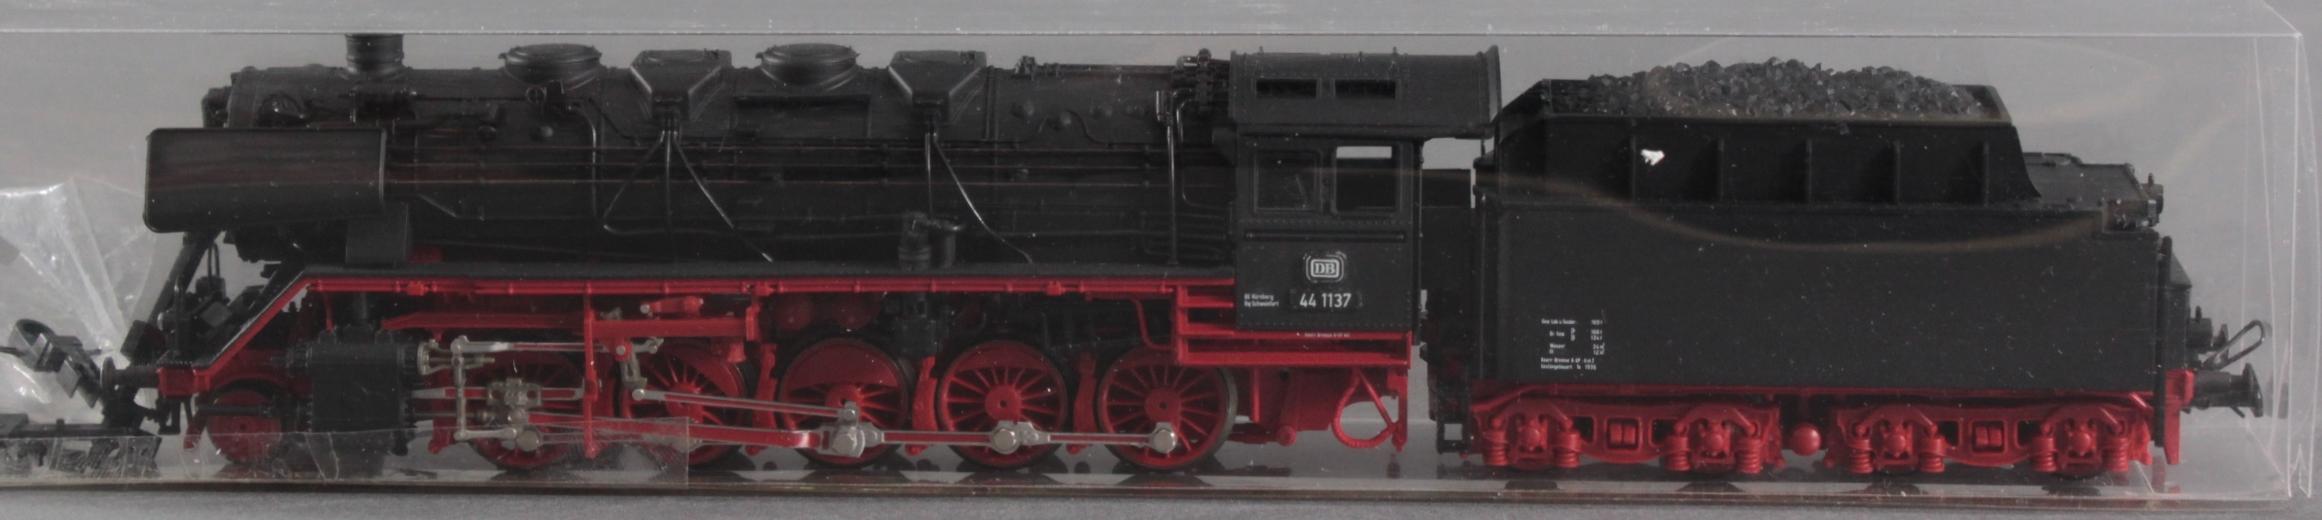 Roco HO Dampflok 44 1137 mit 5 Brawa Güterwaggons-2